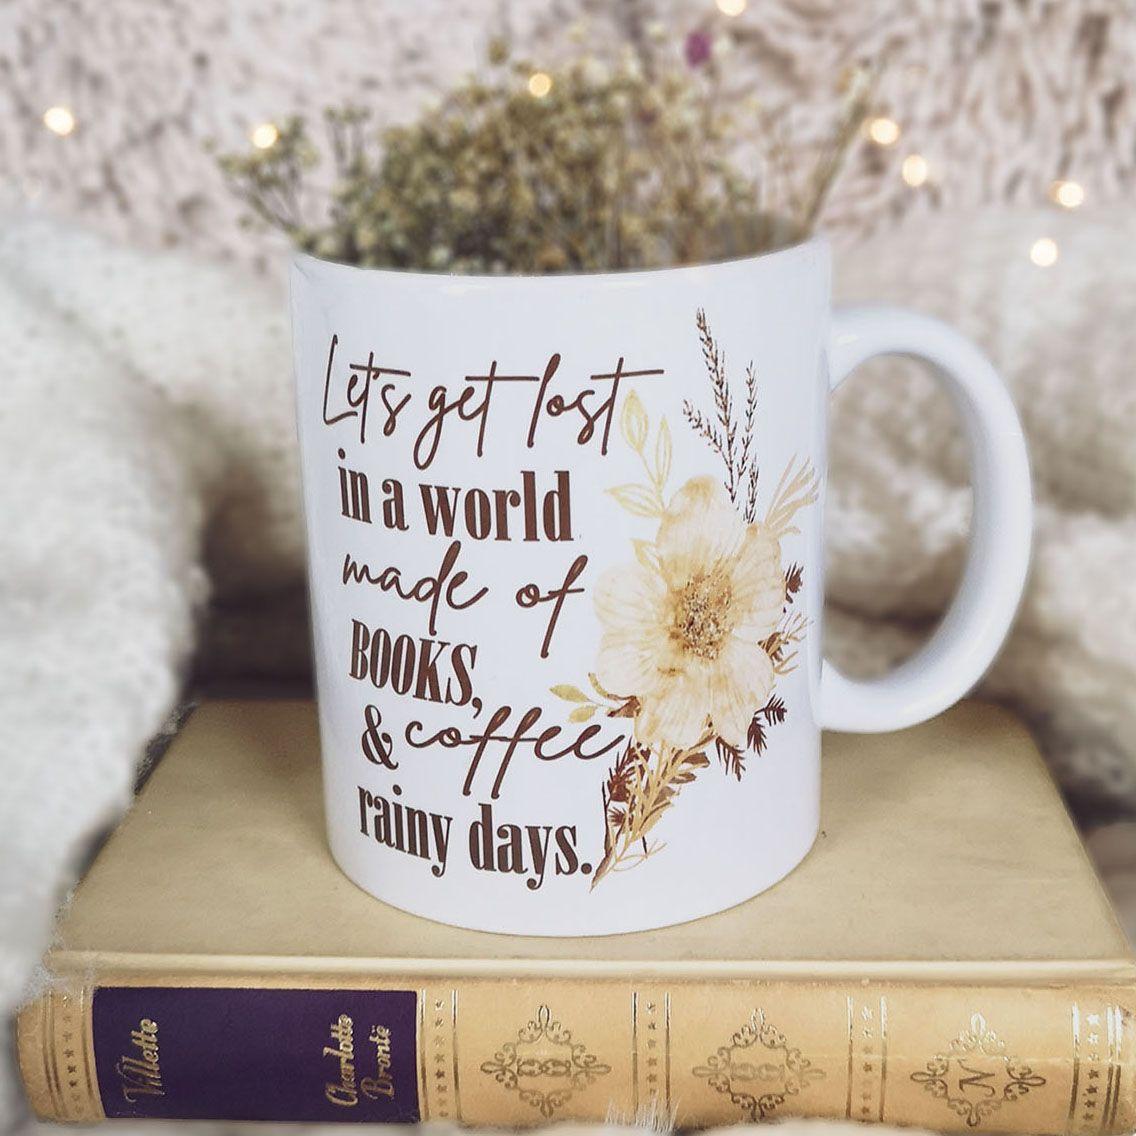 Books, Coffee (or Tea), Rainy Days Mug